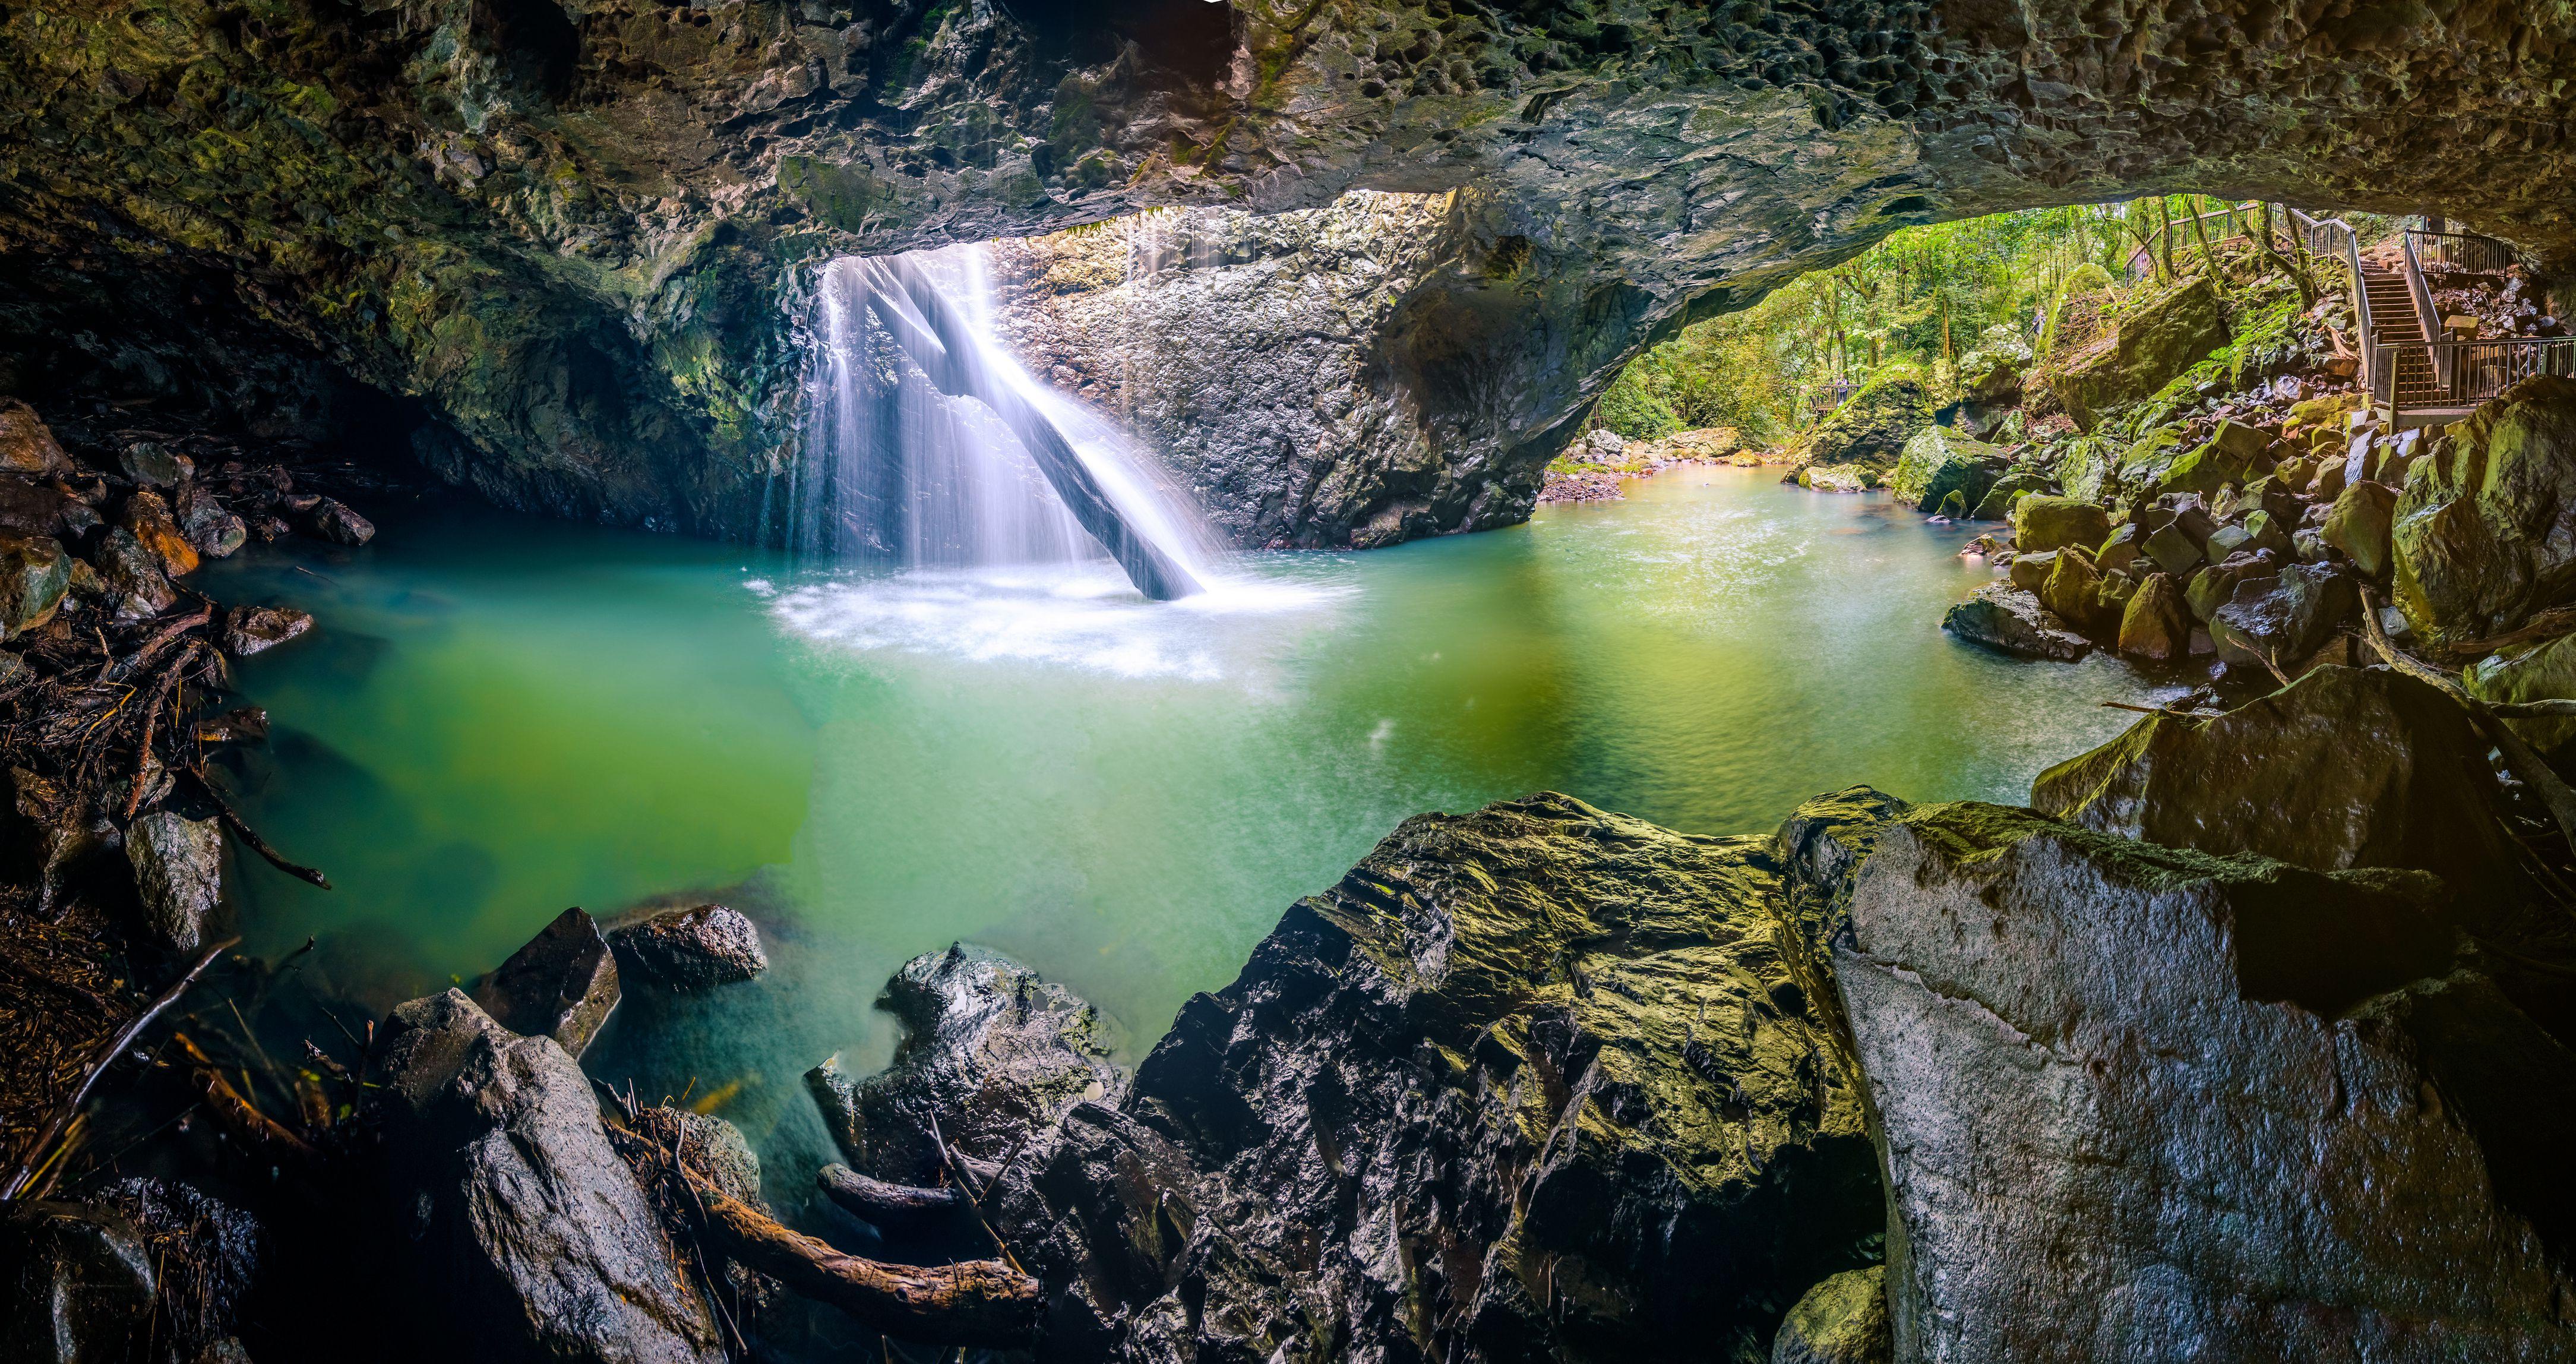 Adventure Awaits In The Rio Secreto Caves Of The Riviera Maya